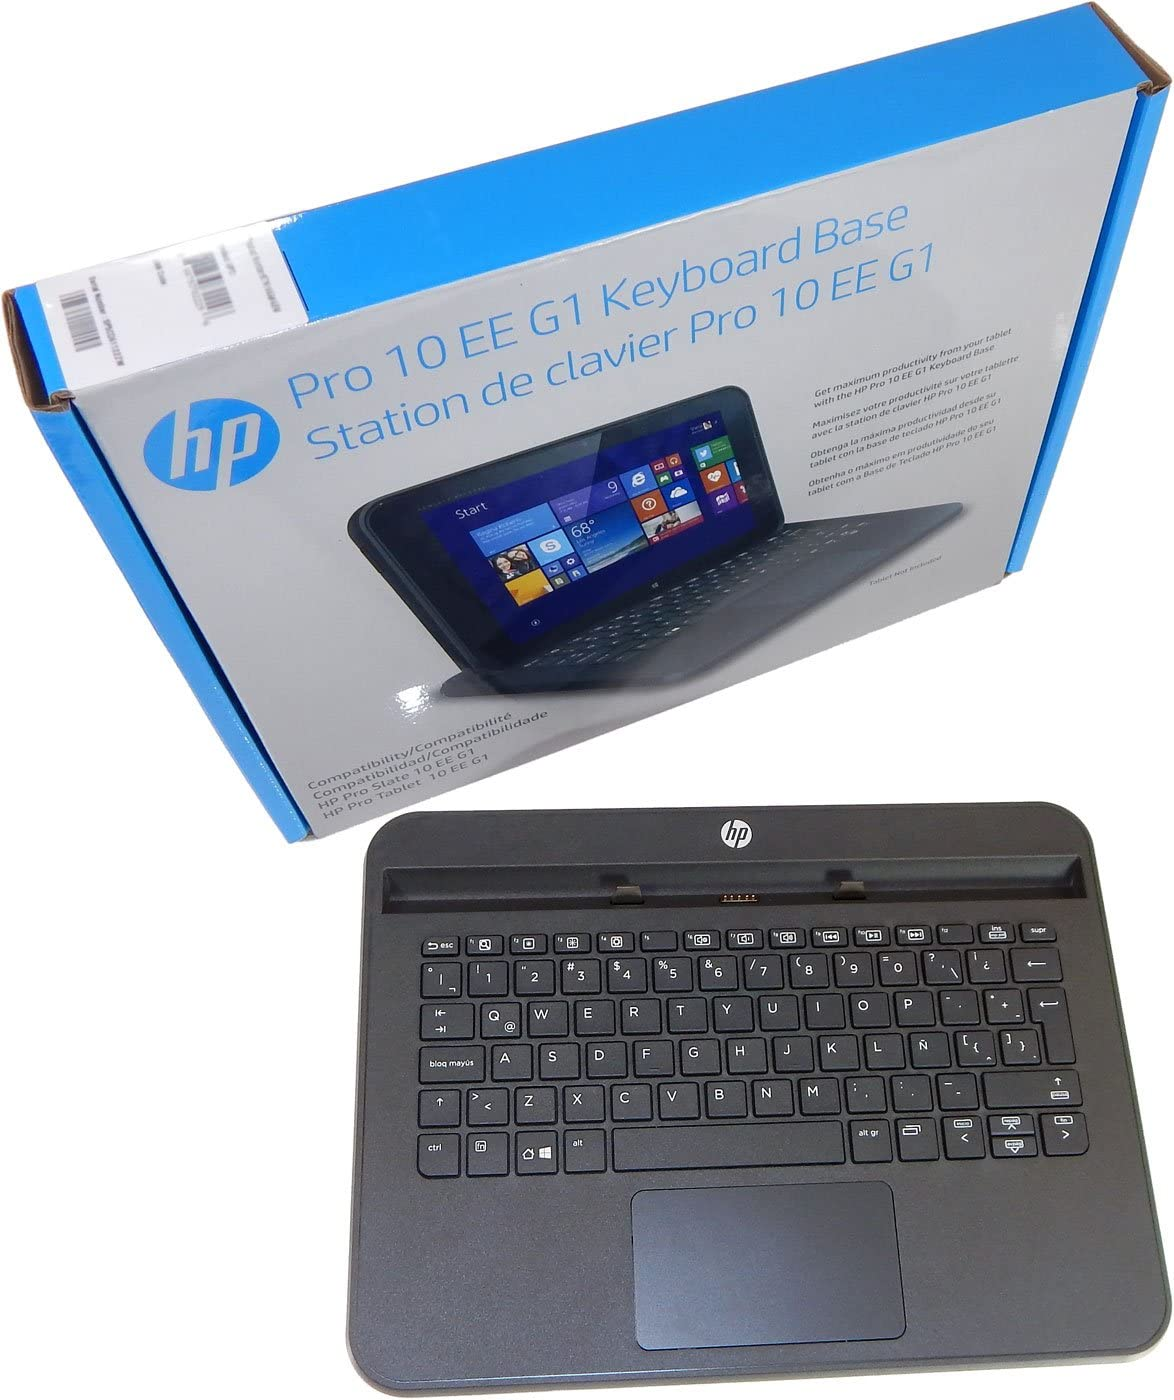 HP Spanish Keyboard Base Pro 10 EE G1 K7N19AA-ABM K7N19AA#ABM